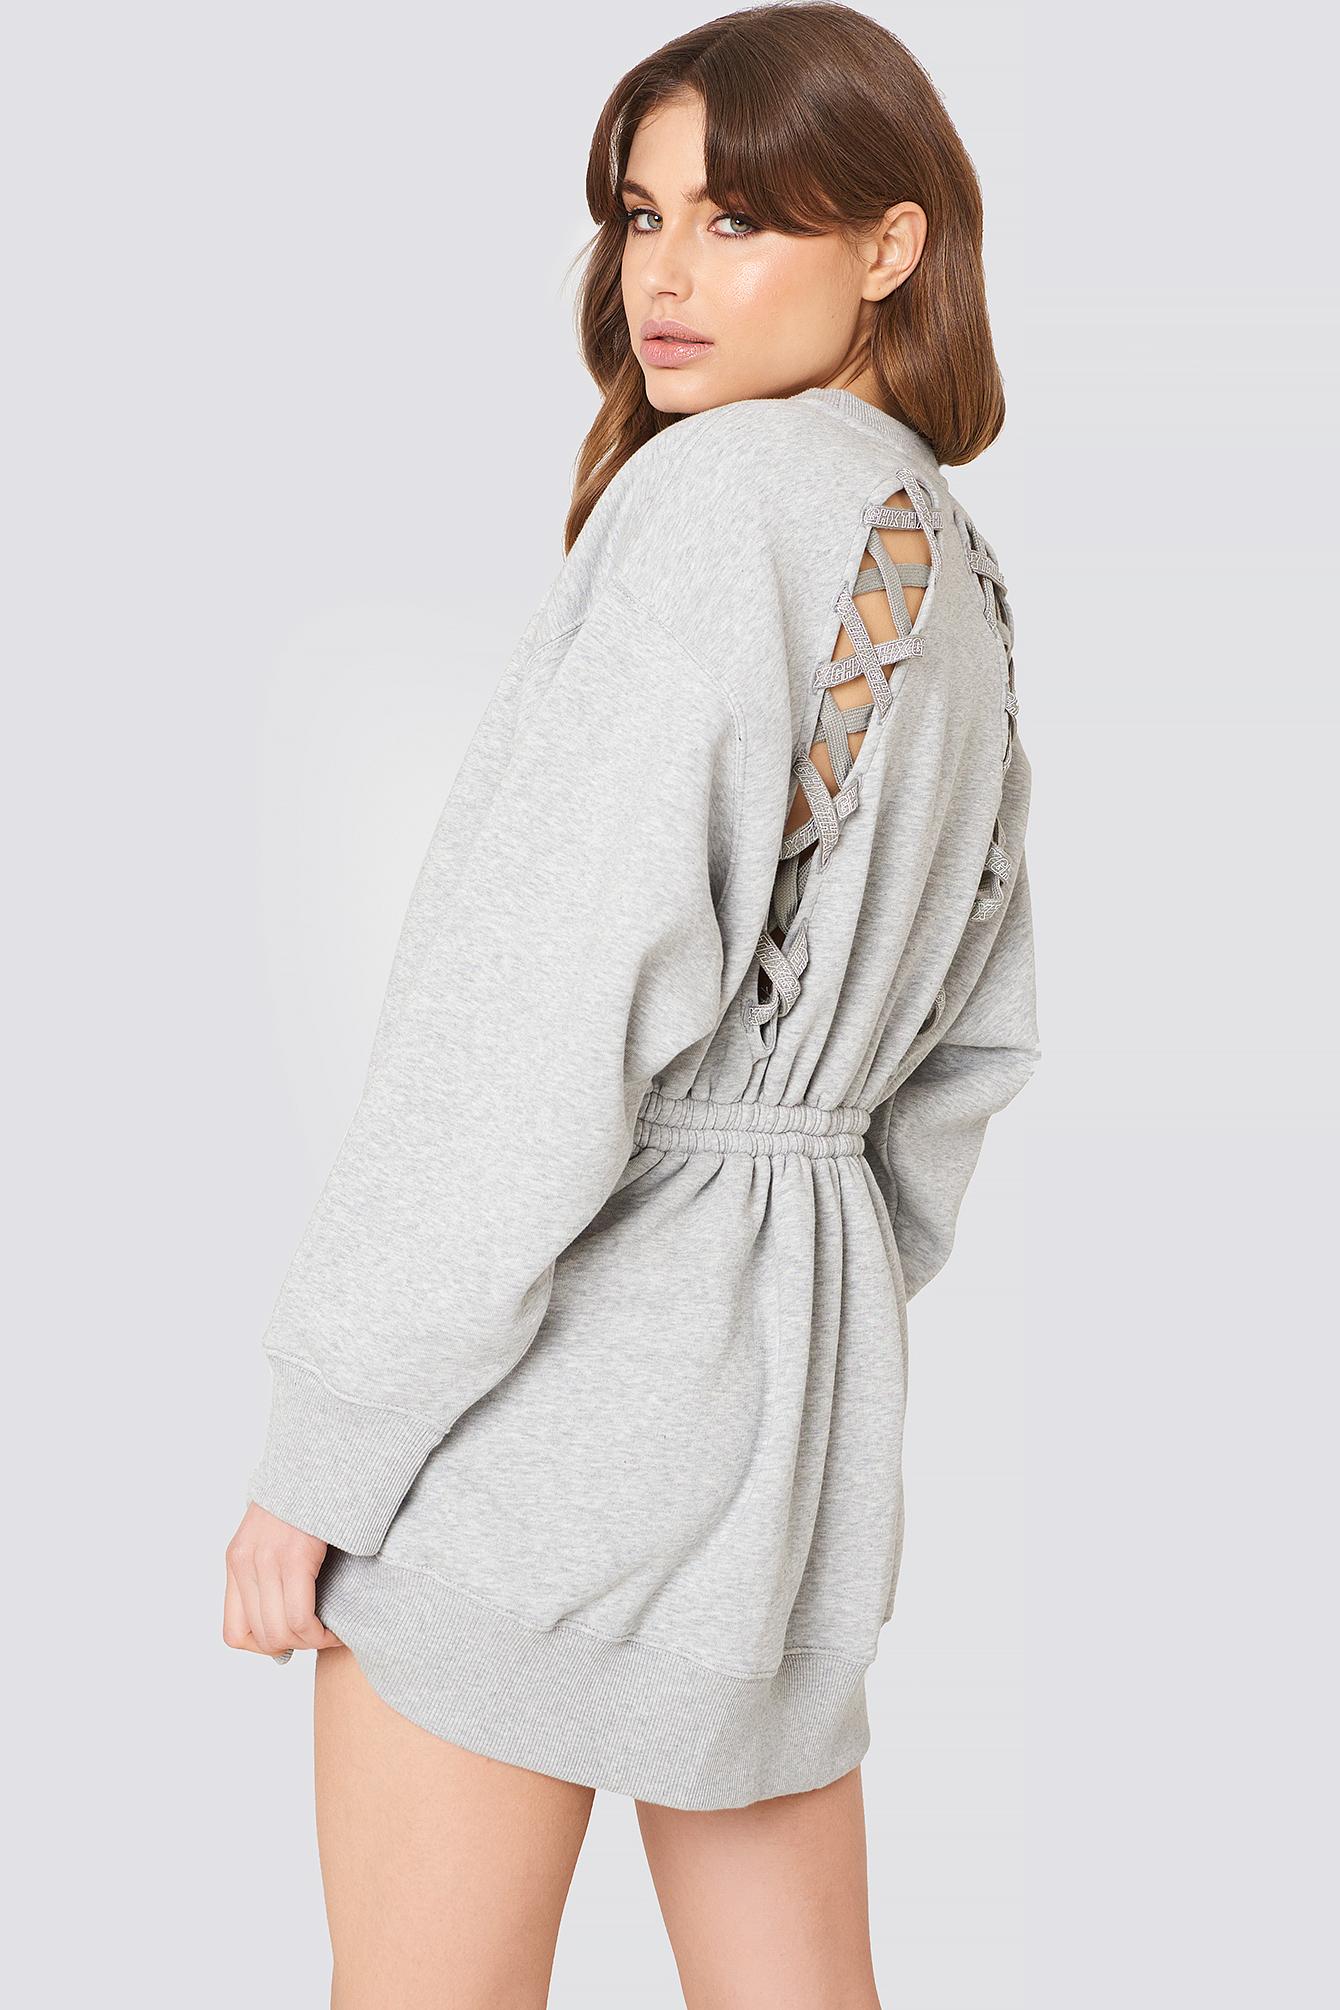 fc93956b8a1 TOMMY HILFIGER Gigi Hadid Open Back Ls Sweatshirt Dress - Grey ...